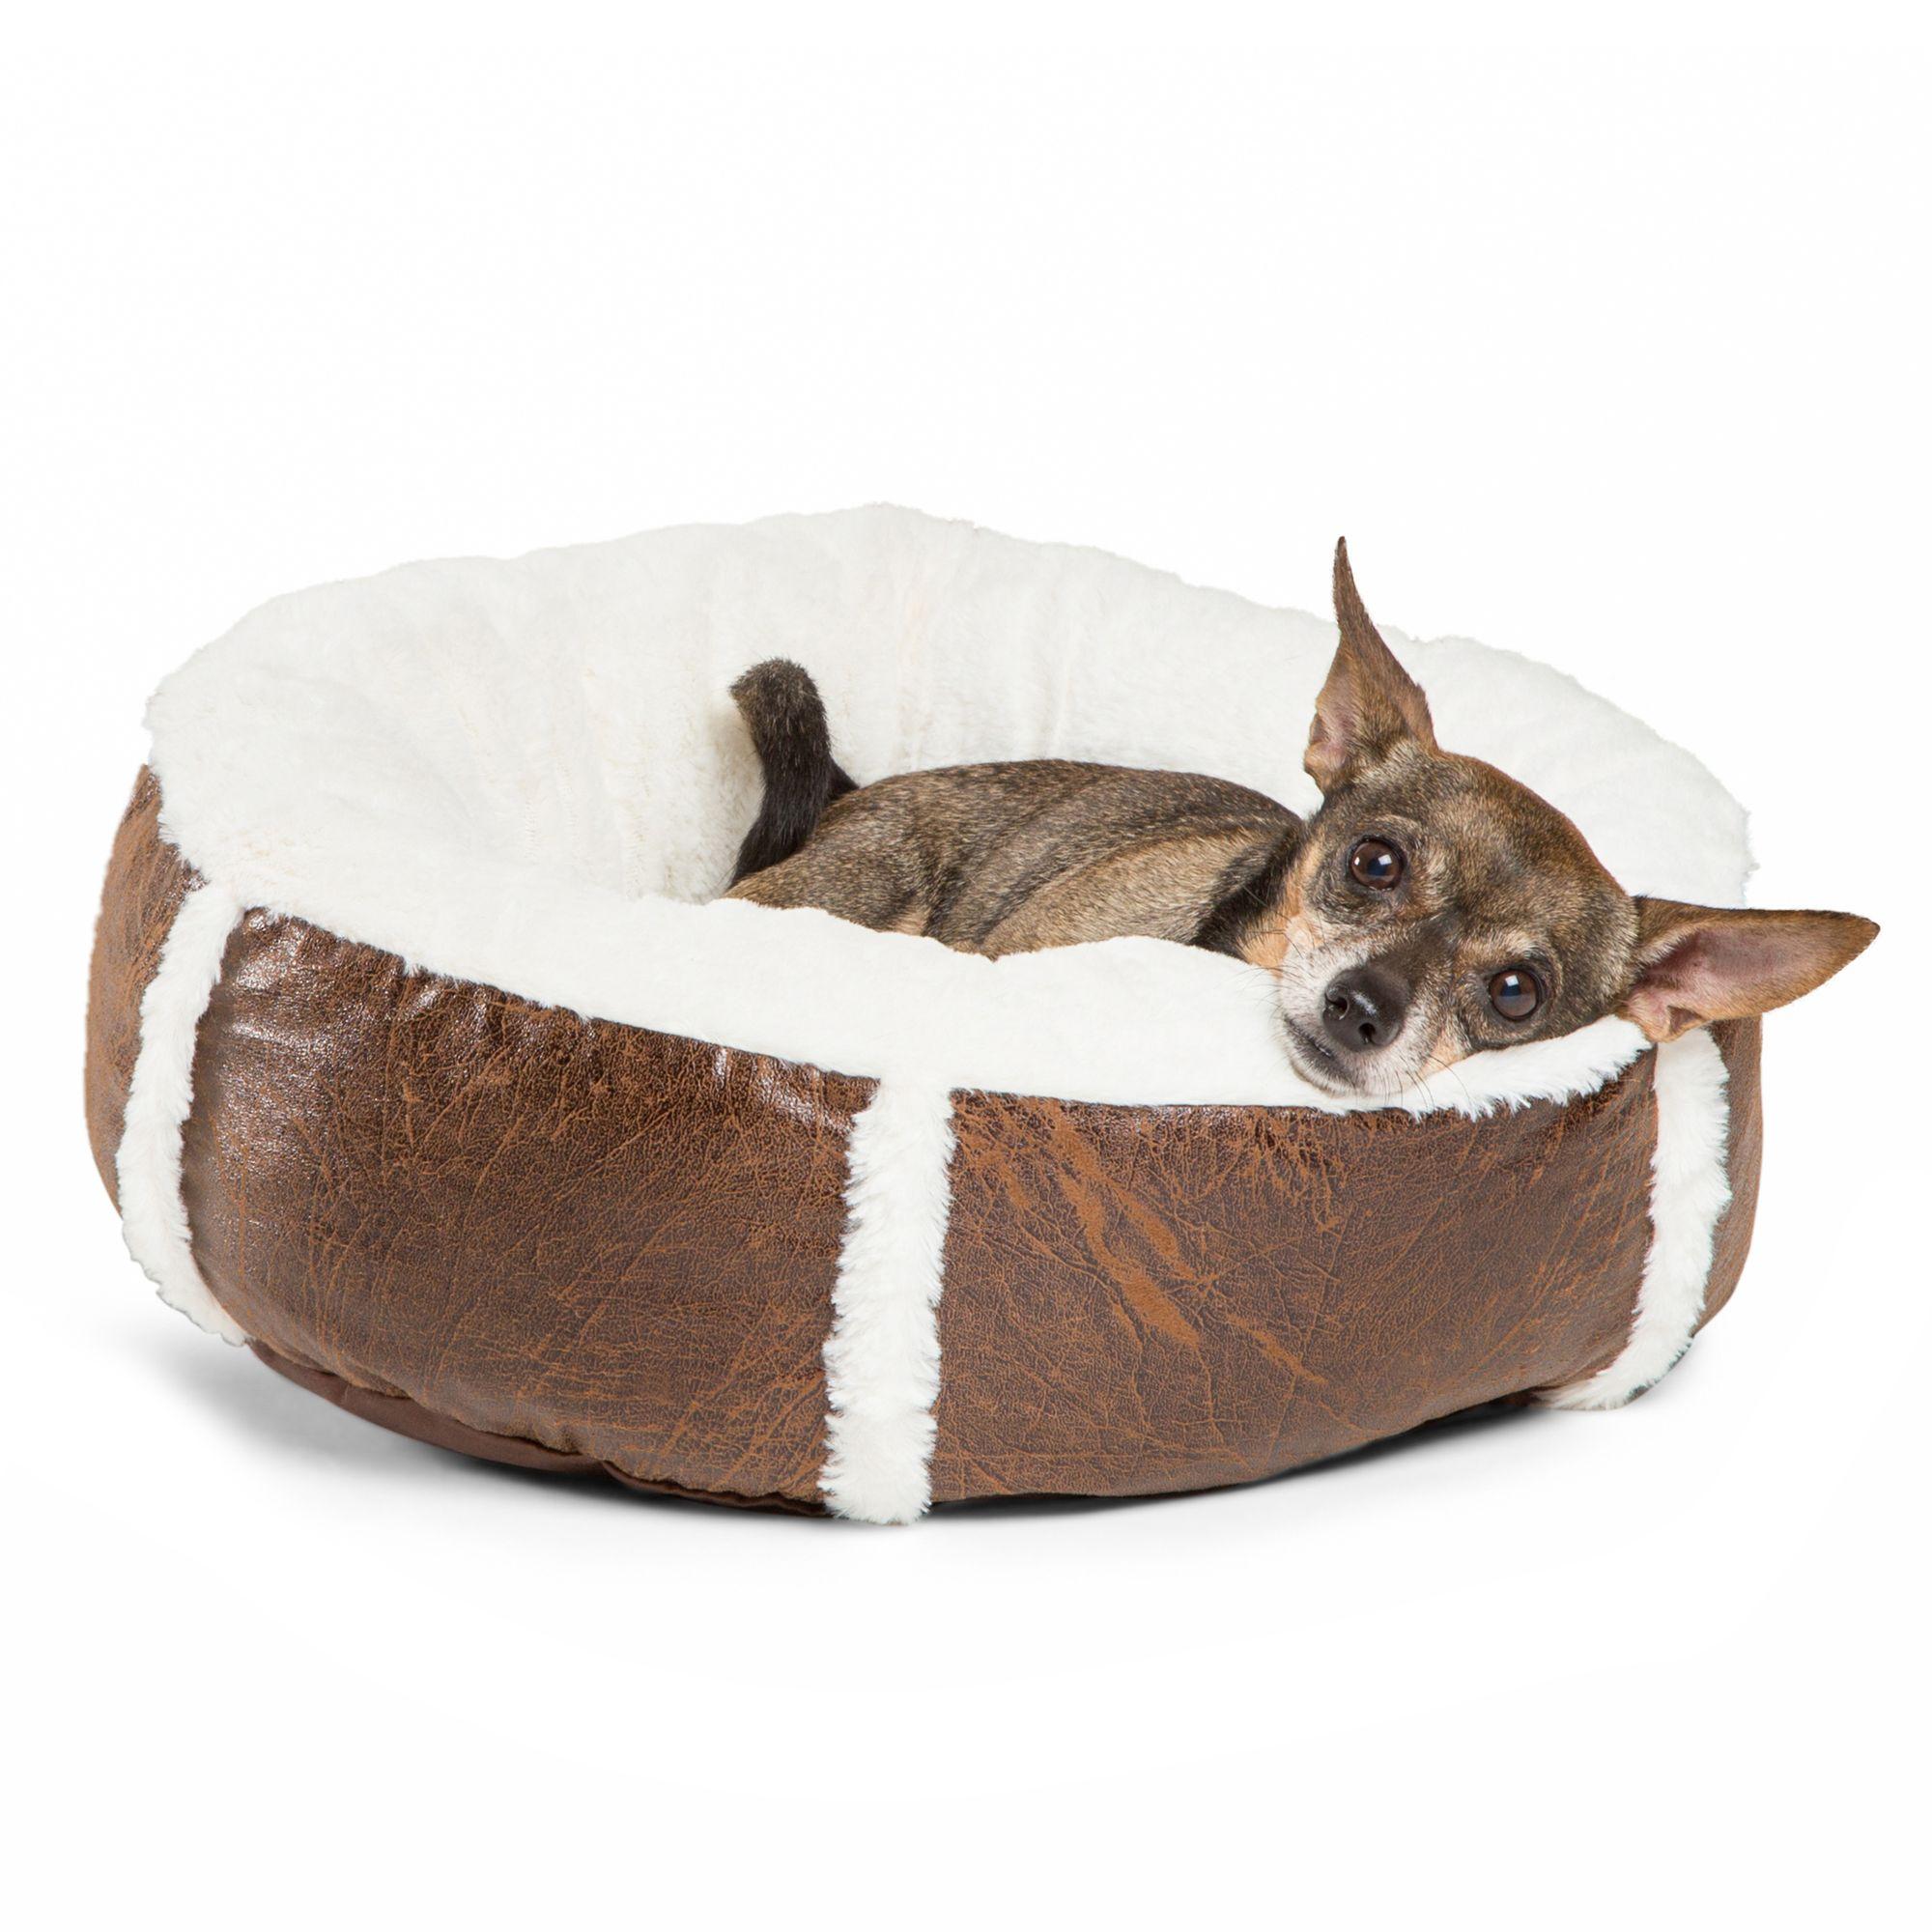 Best Friends By Sheri Bumper Bolster Dog Bed Size 30l X 30w X 10h